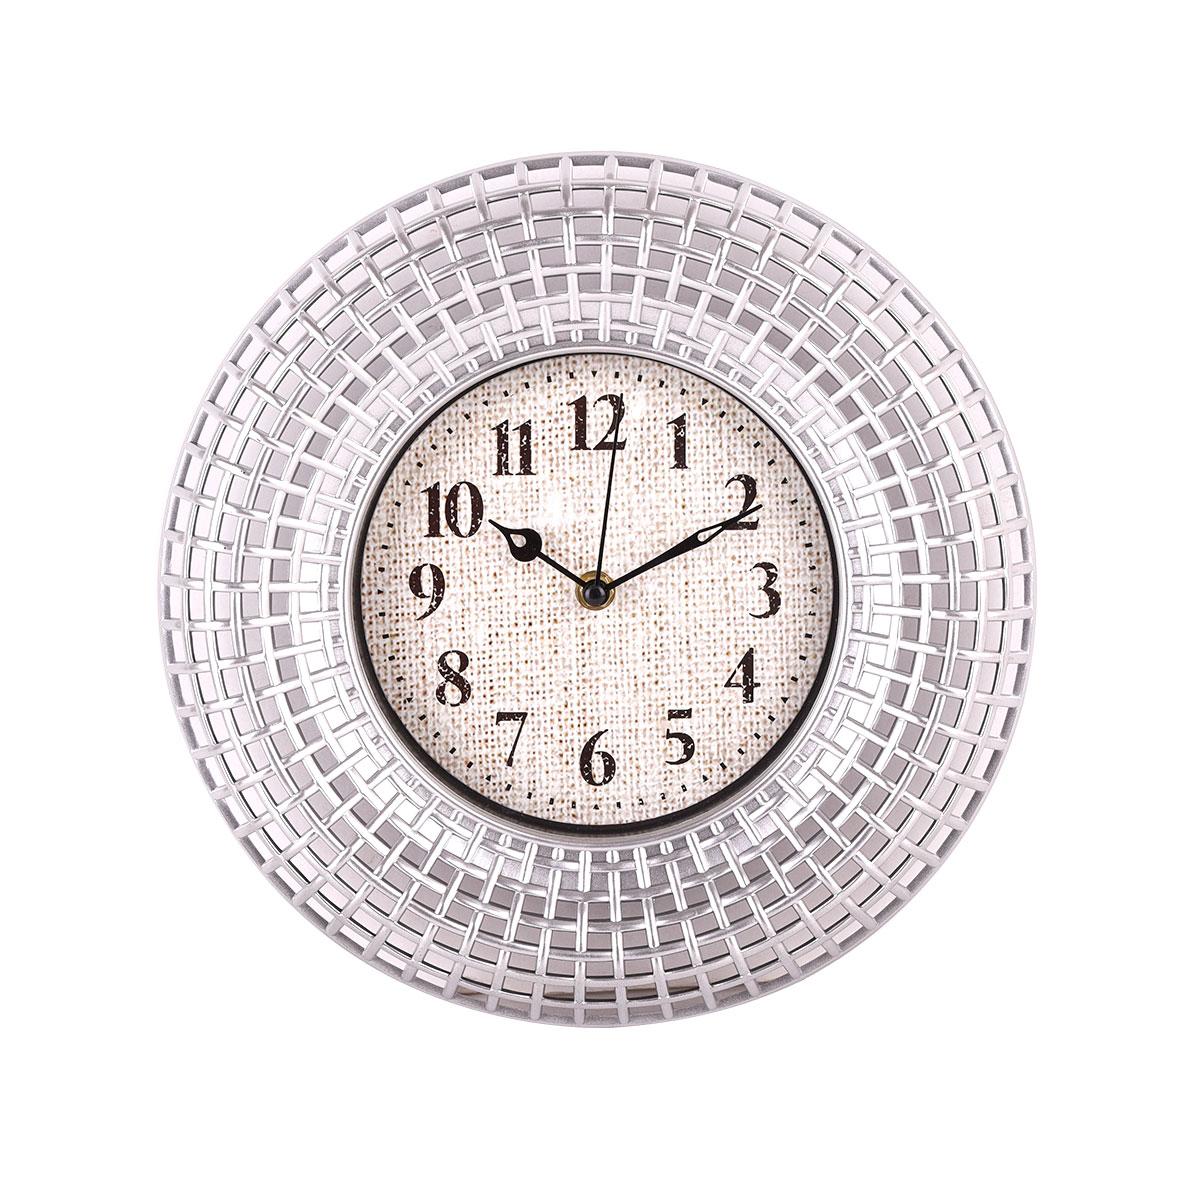 ساعة حائط  دائرية الشكل رقم -MC0031